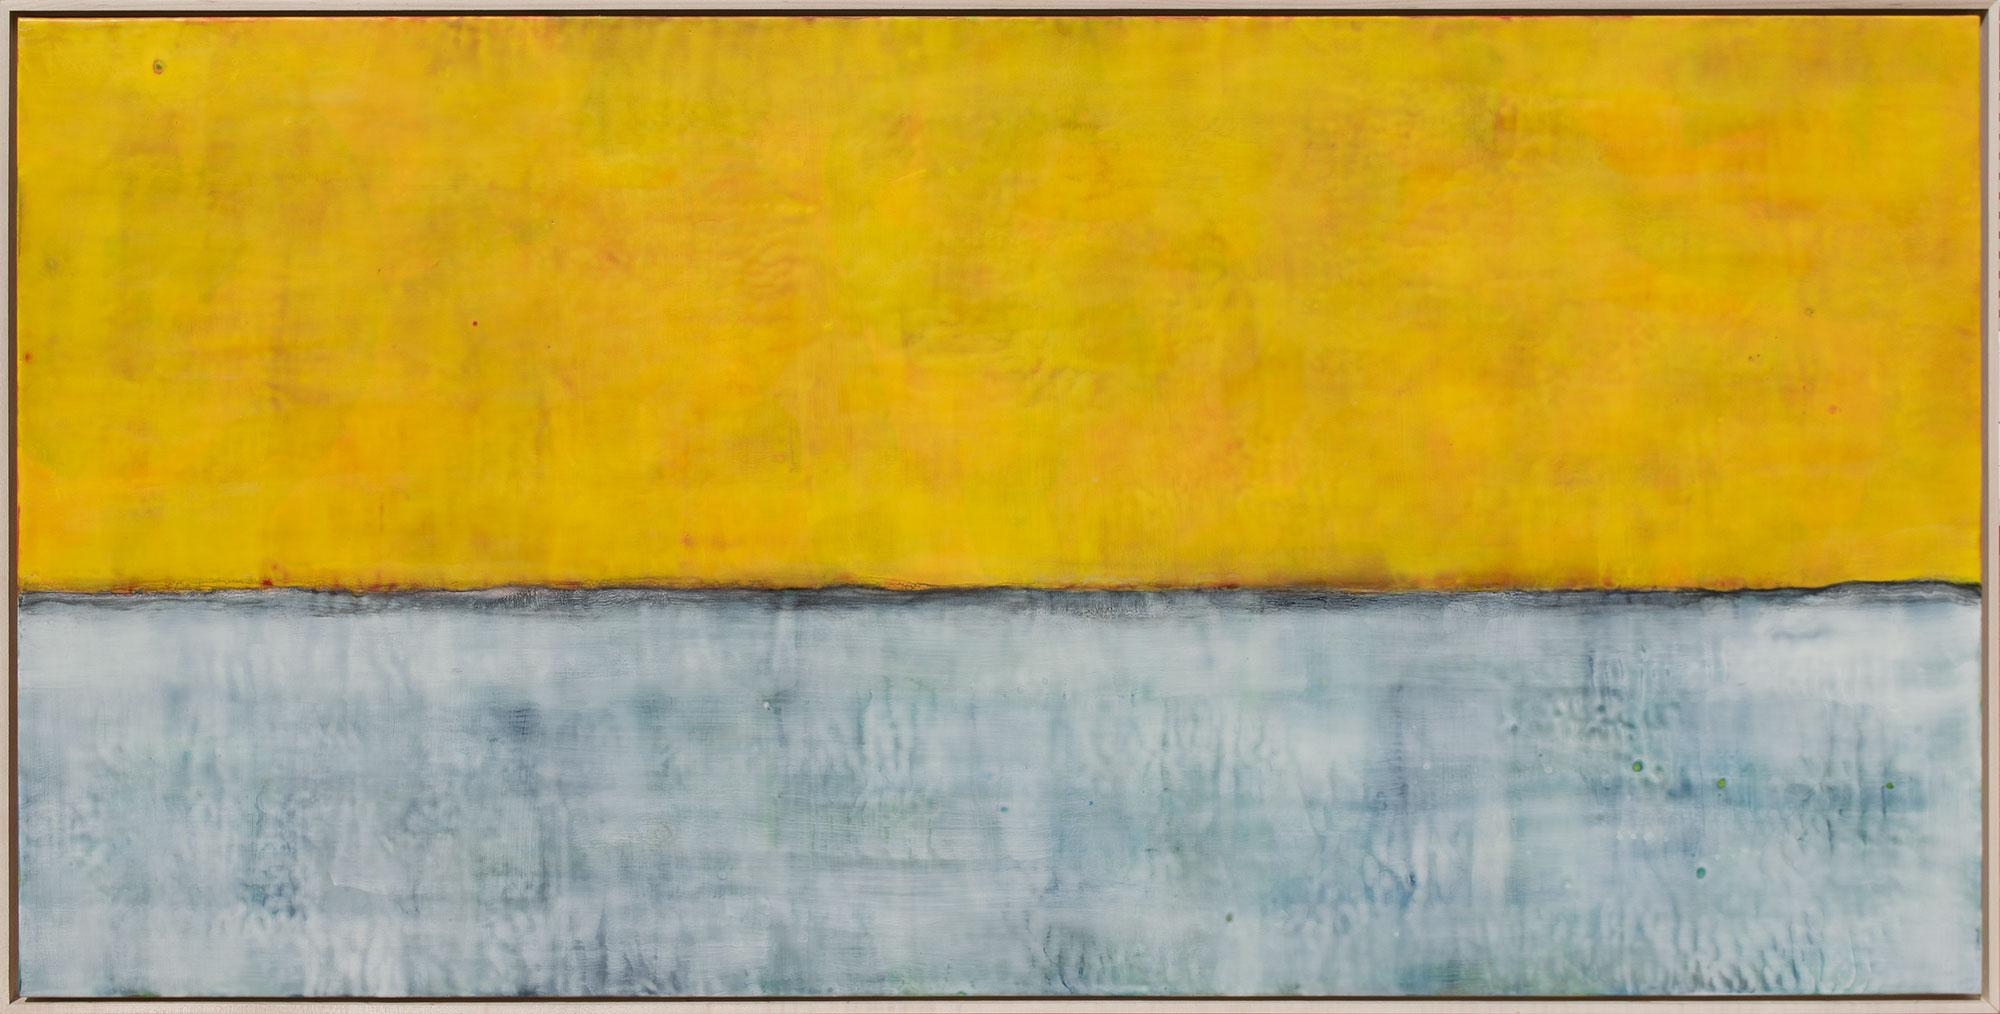 "🔴Daylight Fading 37.5 x 73.5"" framed $ 7,800."